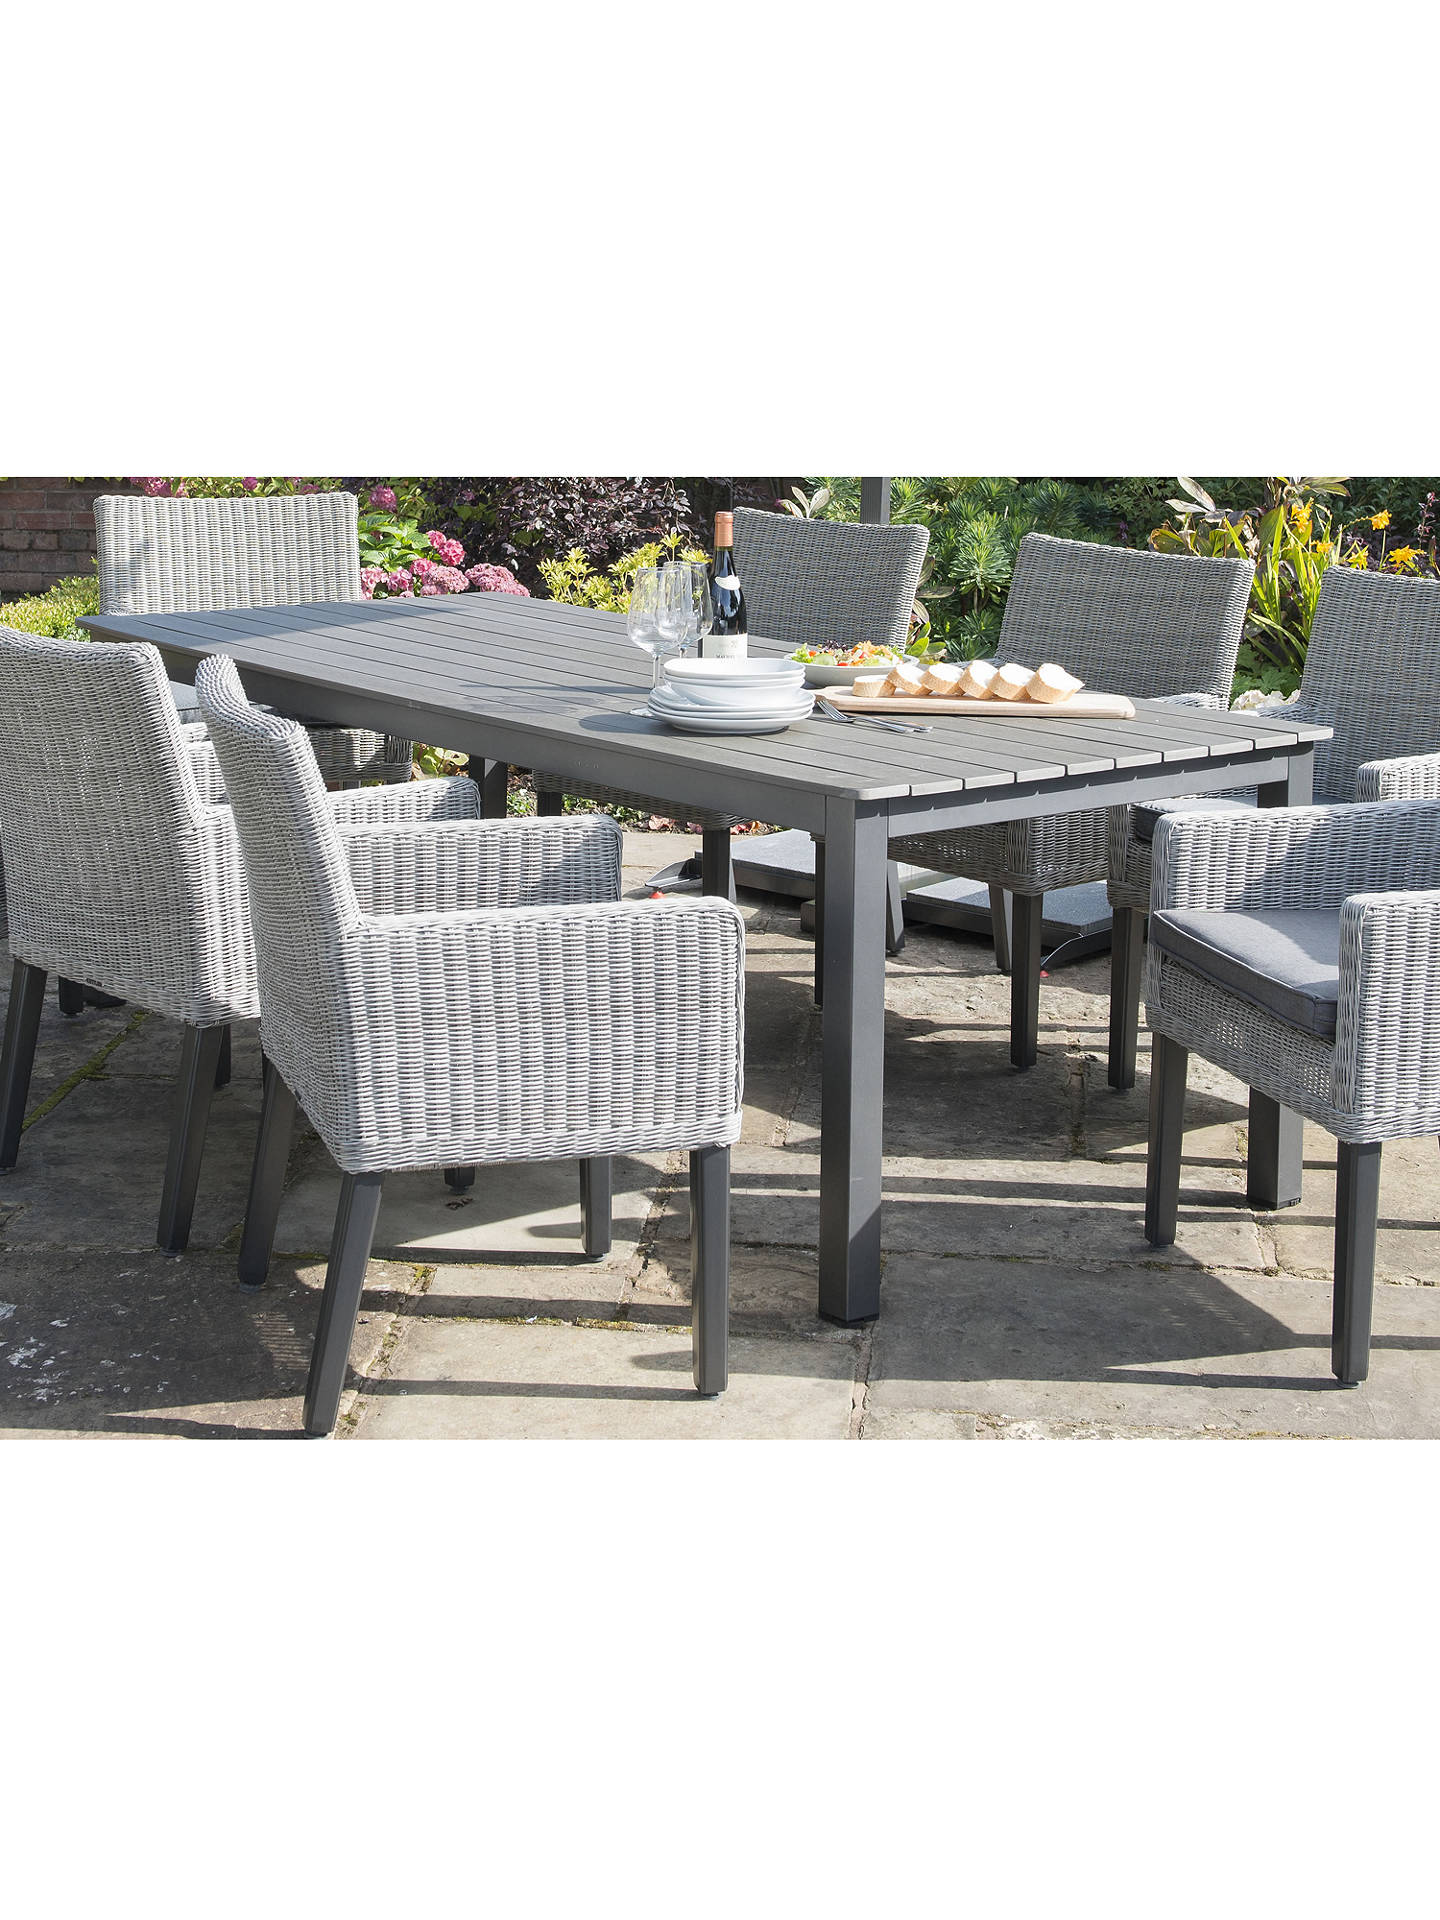 kettler bretagne 8seater outdoor dining table at john